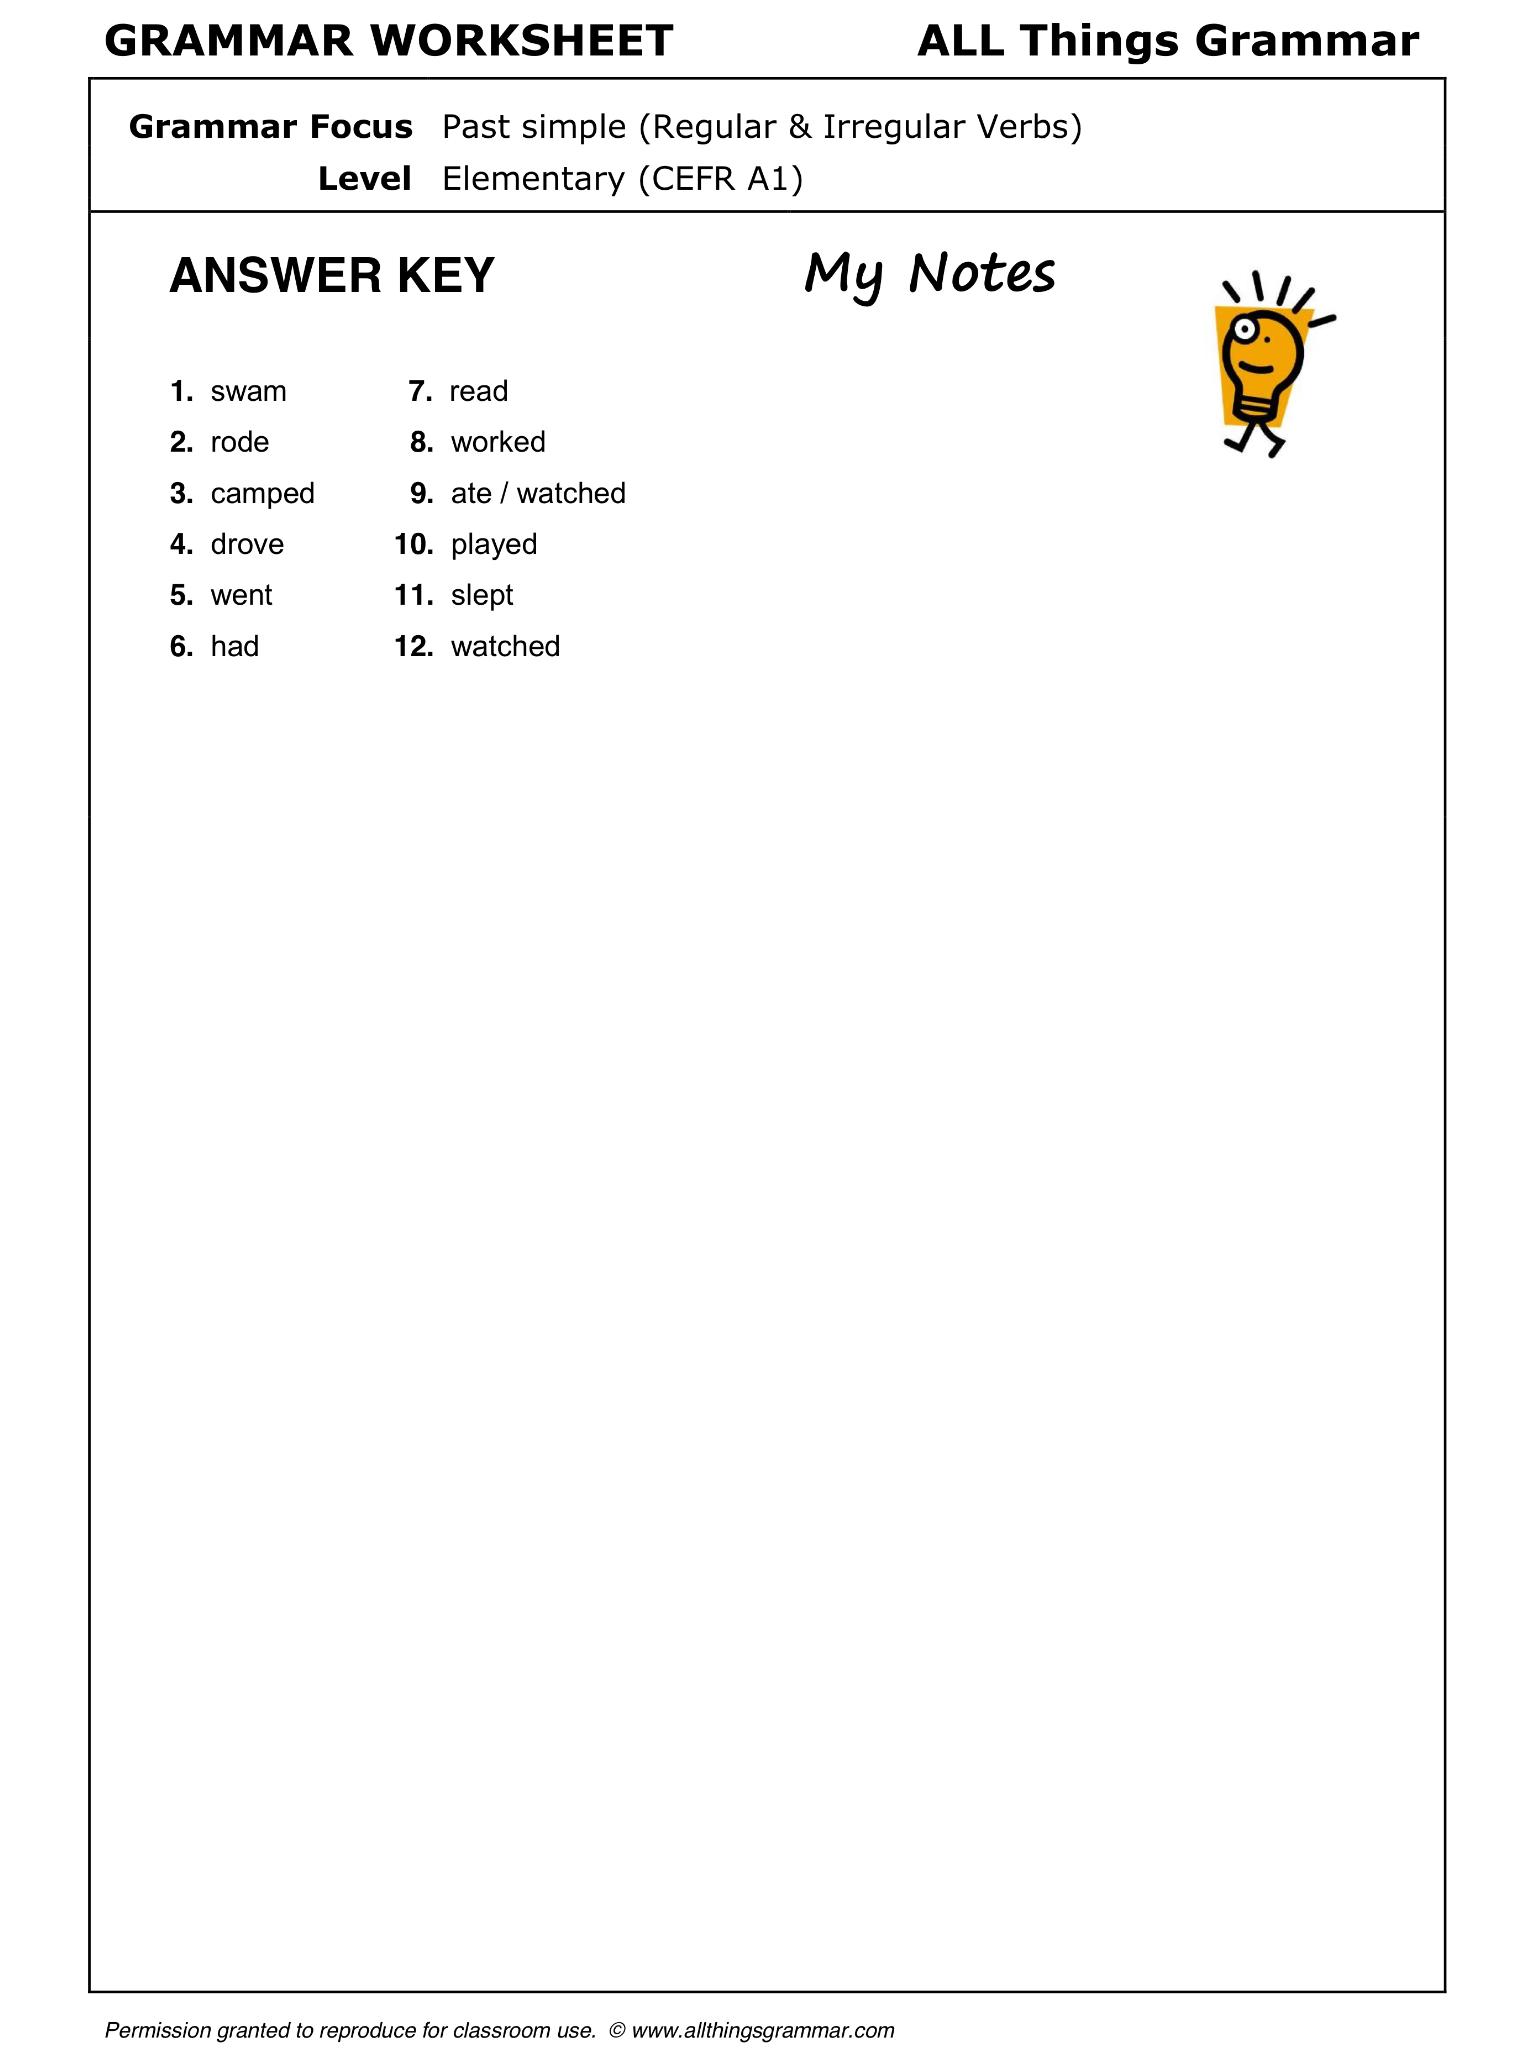 English Grammar Worksheet Past Simple Regular